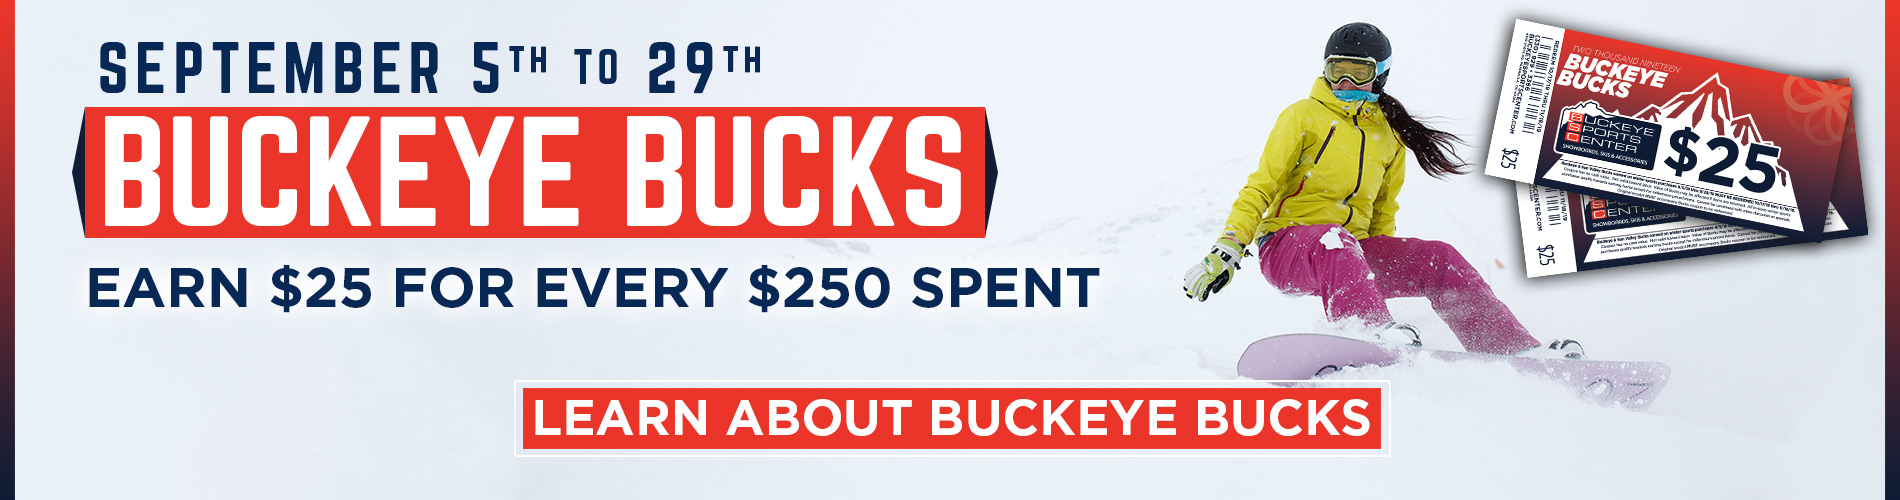 Earn $25 For Every $250 Spent on Winter Sports Gear